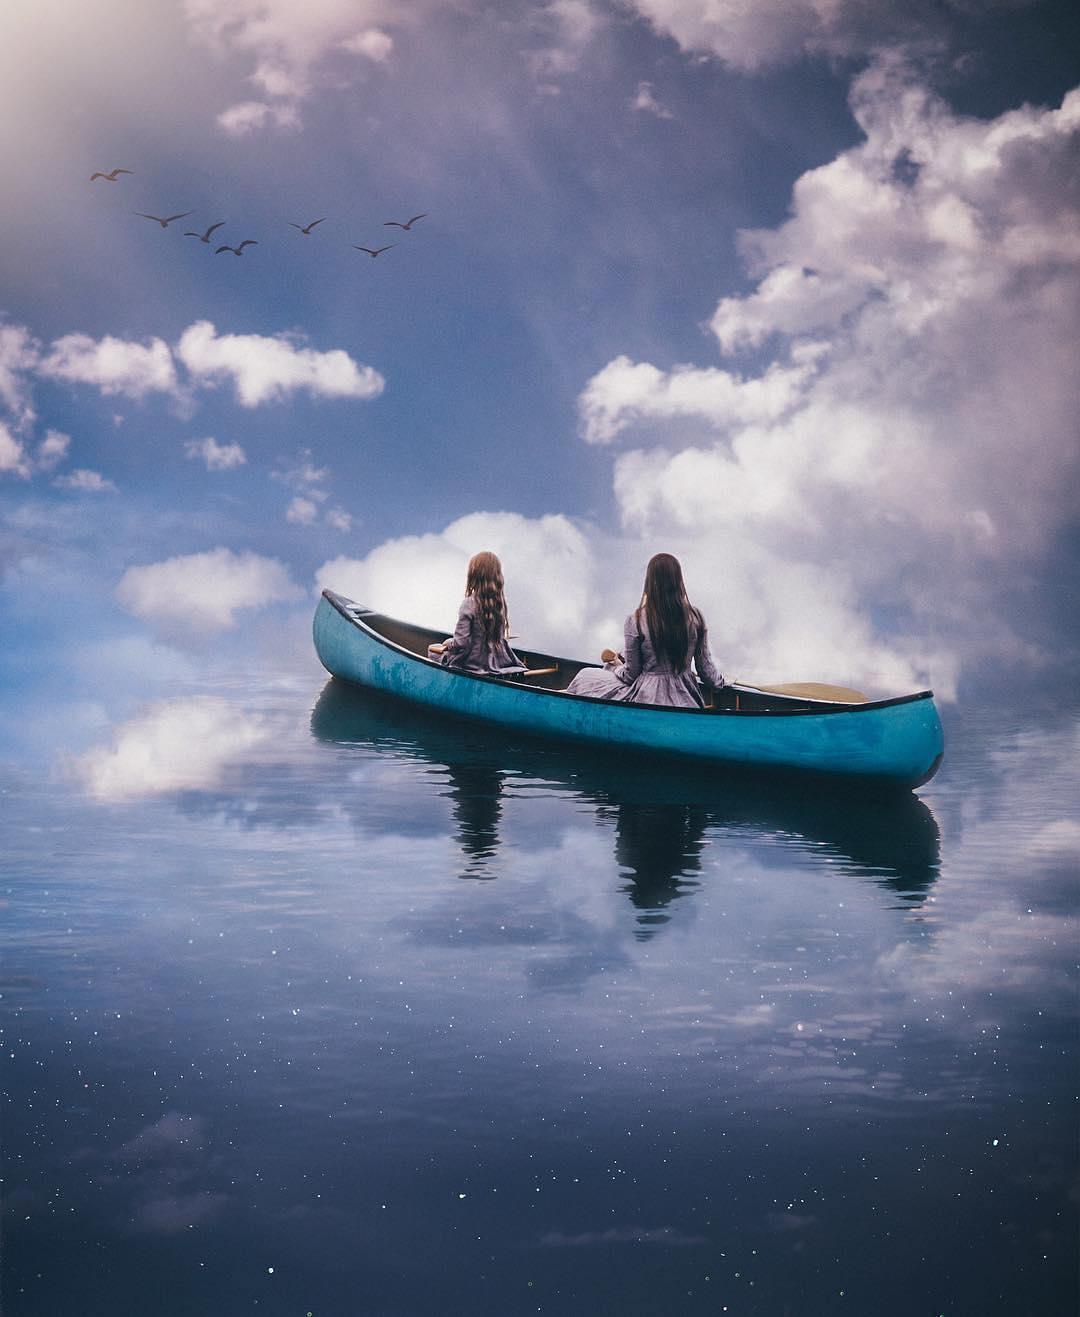 adobe photoshop creative cloud sail